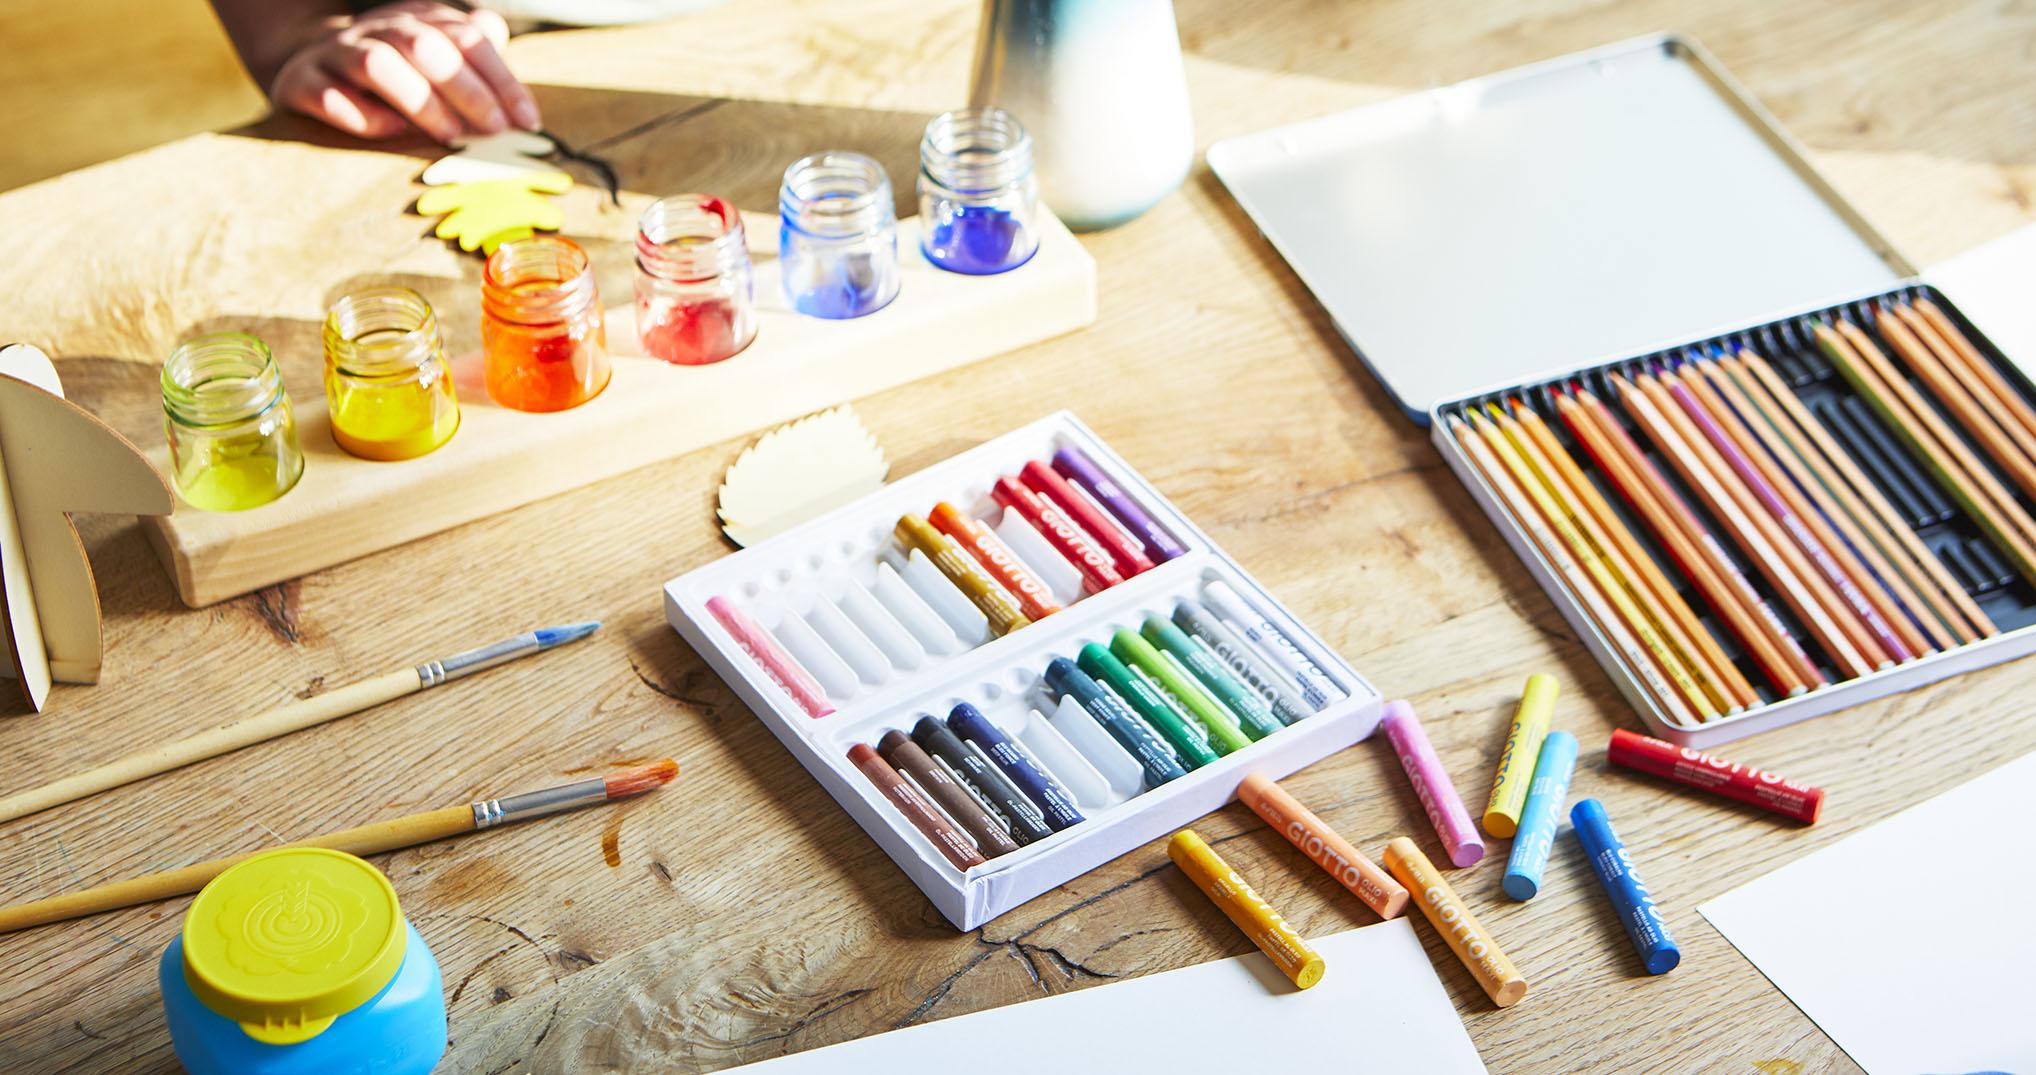 Waldorf Curriculum Homeschool Class 2 term mentored by Daphne  and Funmi